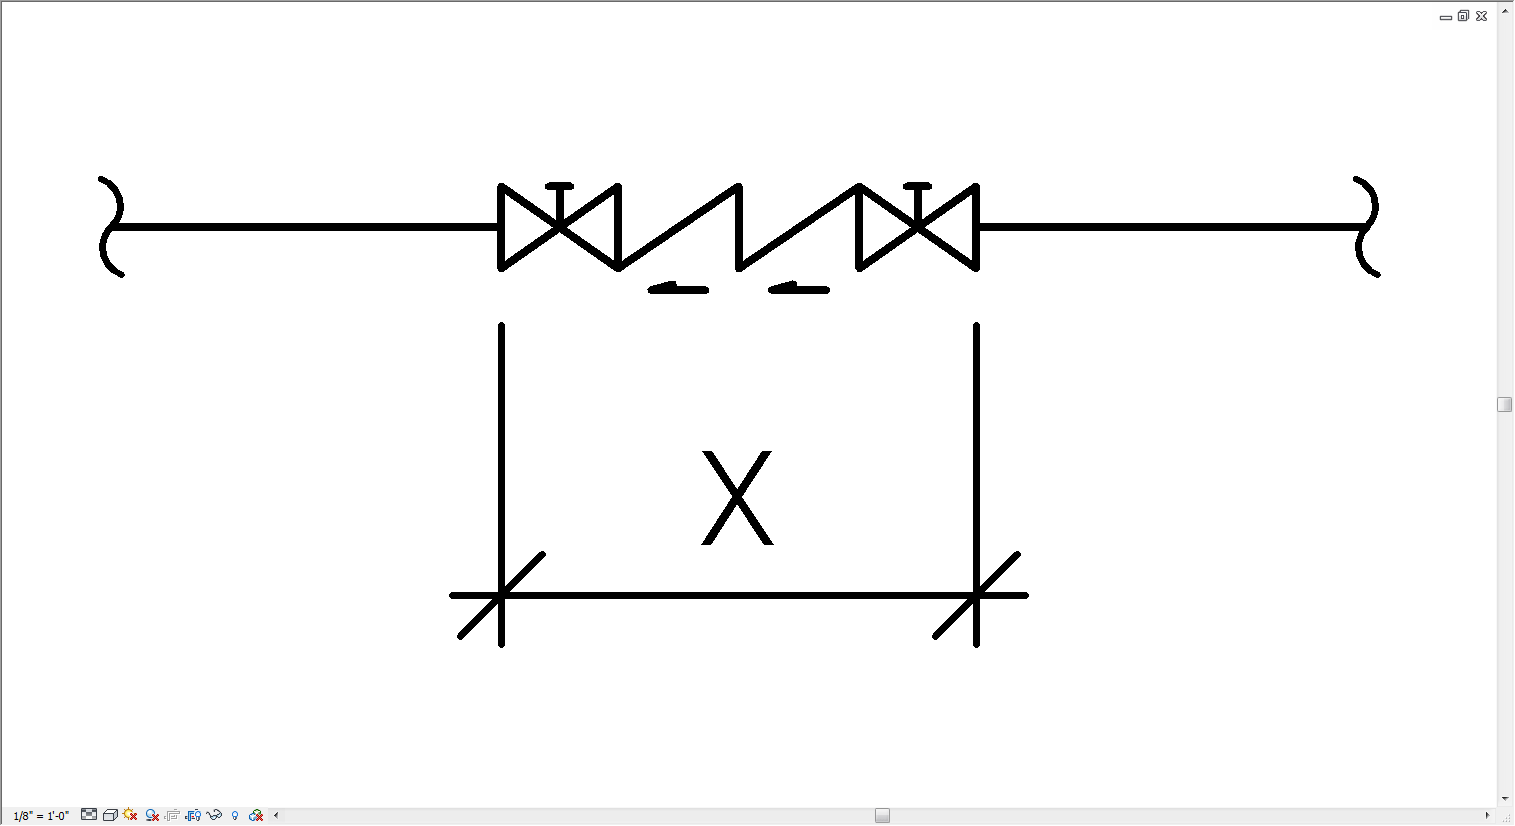 Plumbing Schematic Symbols